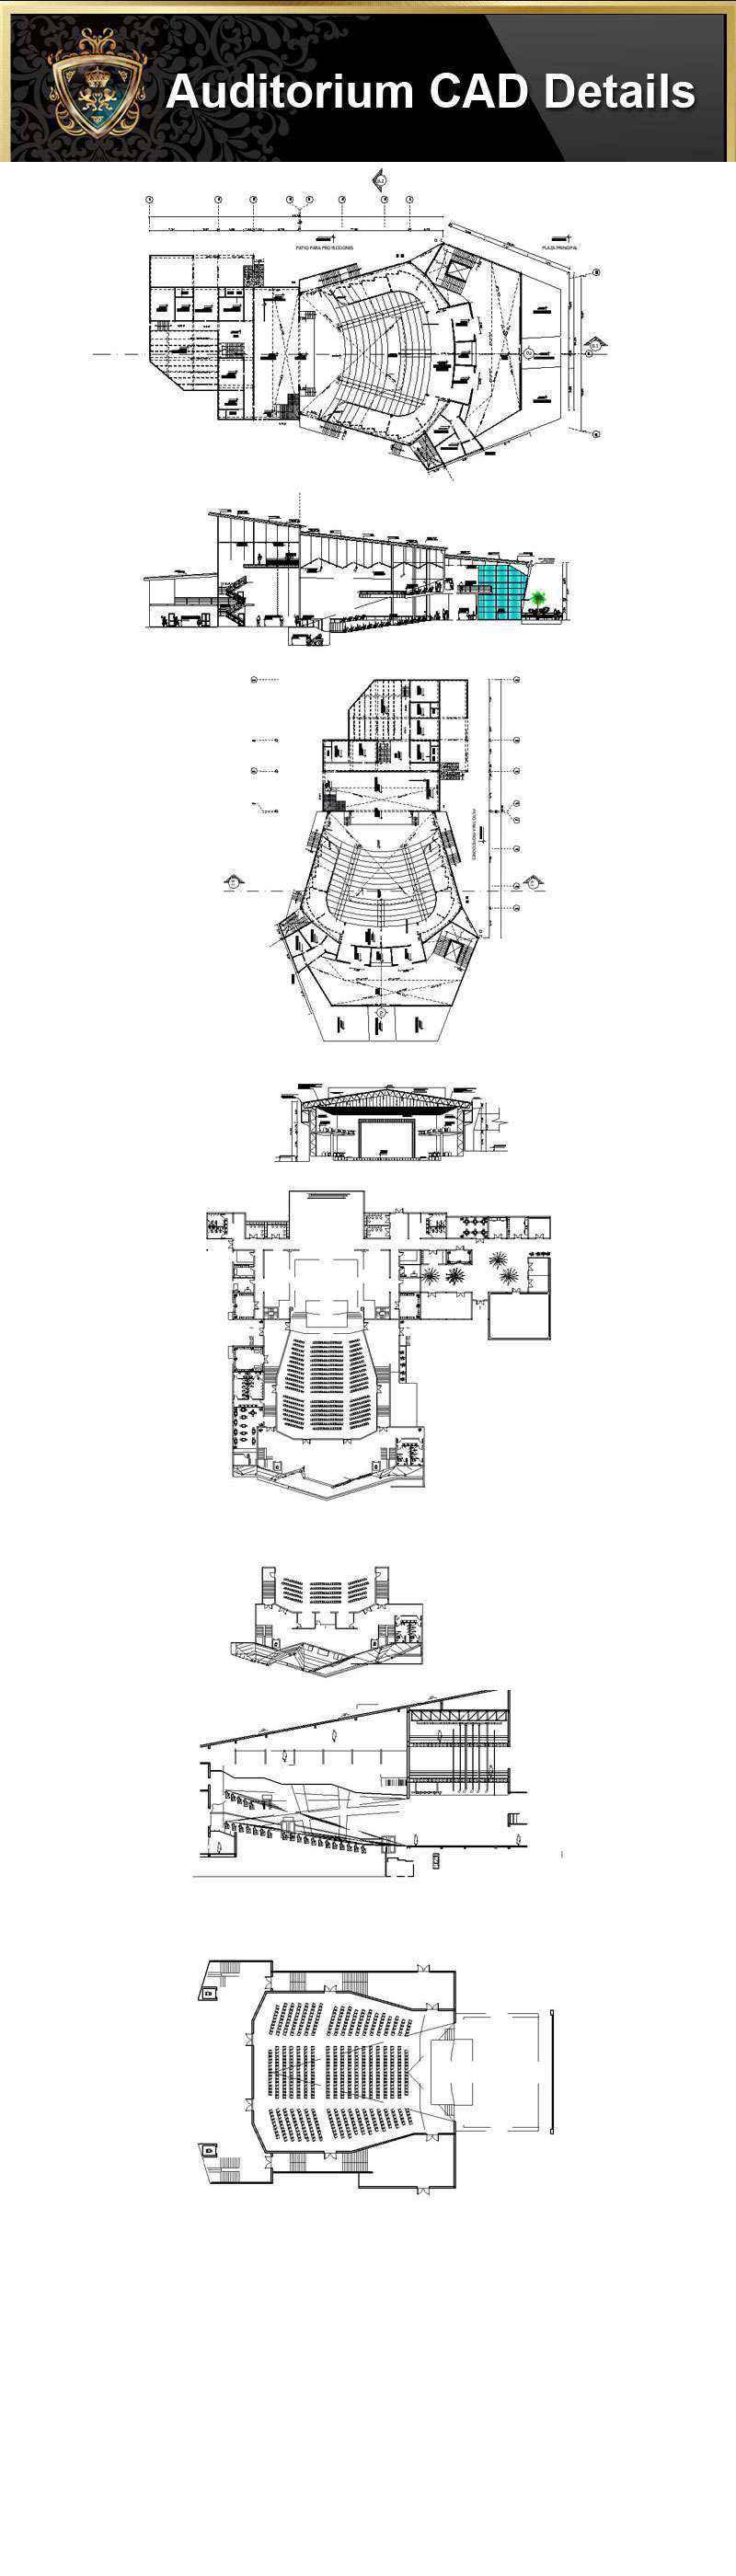 Architecture Details, Architecture drawings, Auditorium Design, Auditorium elevation design drawings, Auditorium Section, AuditoriumDetails, Autocad Blocks, Decorative elements-Frame, home design, Interior Design CAD Collection, Landscape Architecture, Neoclassical Interiors Decor